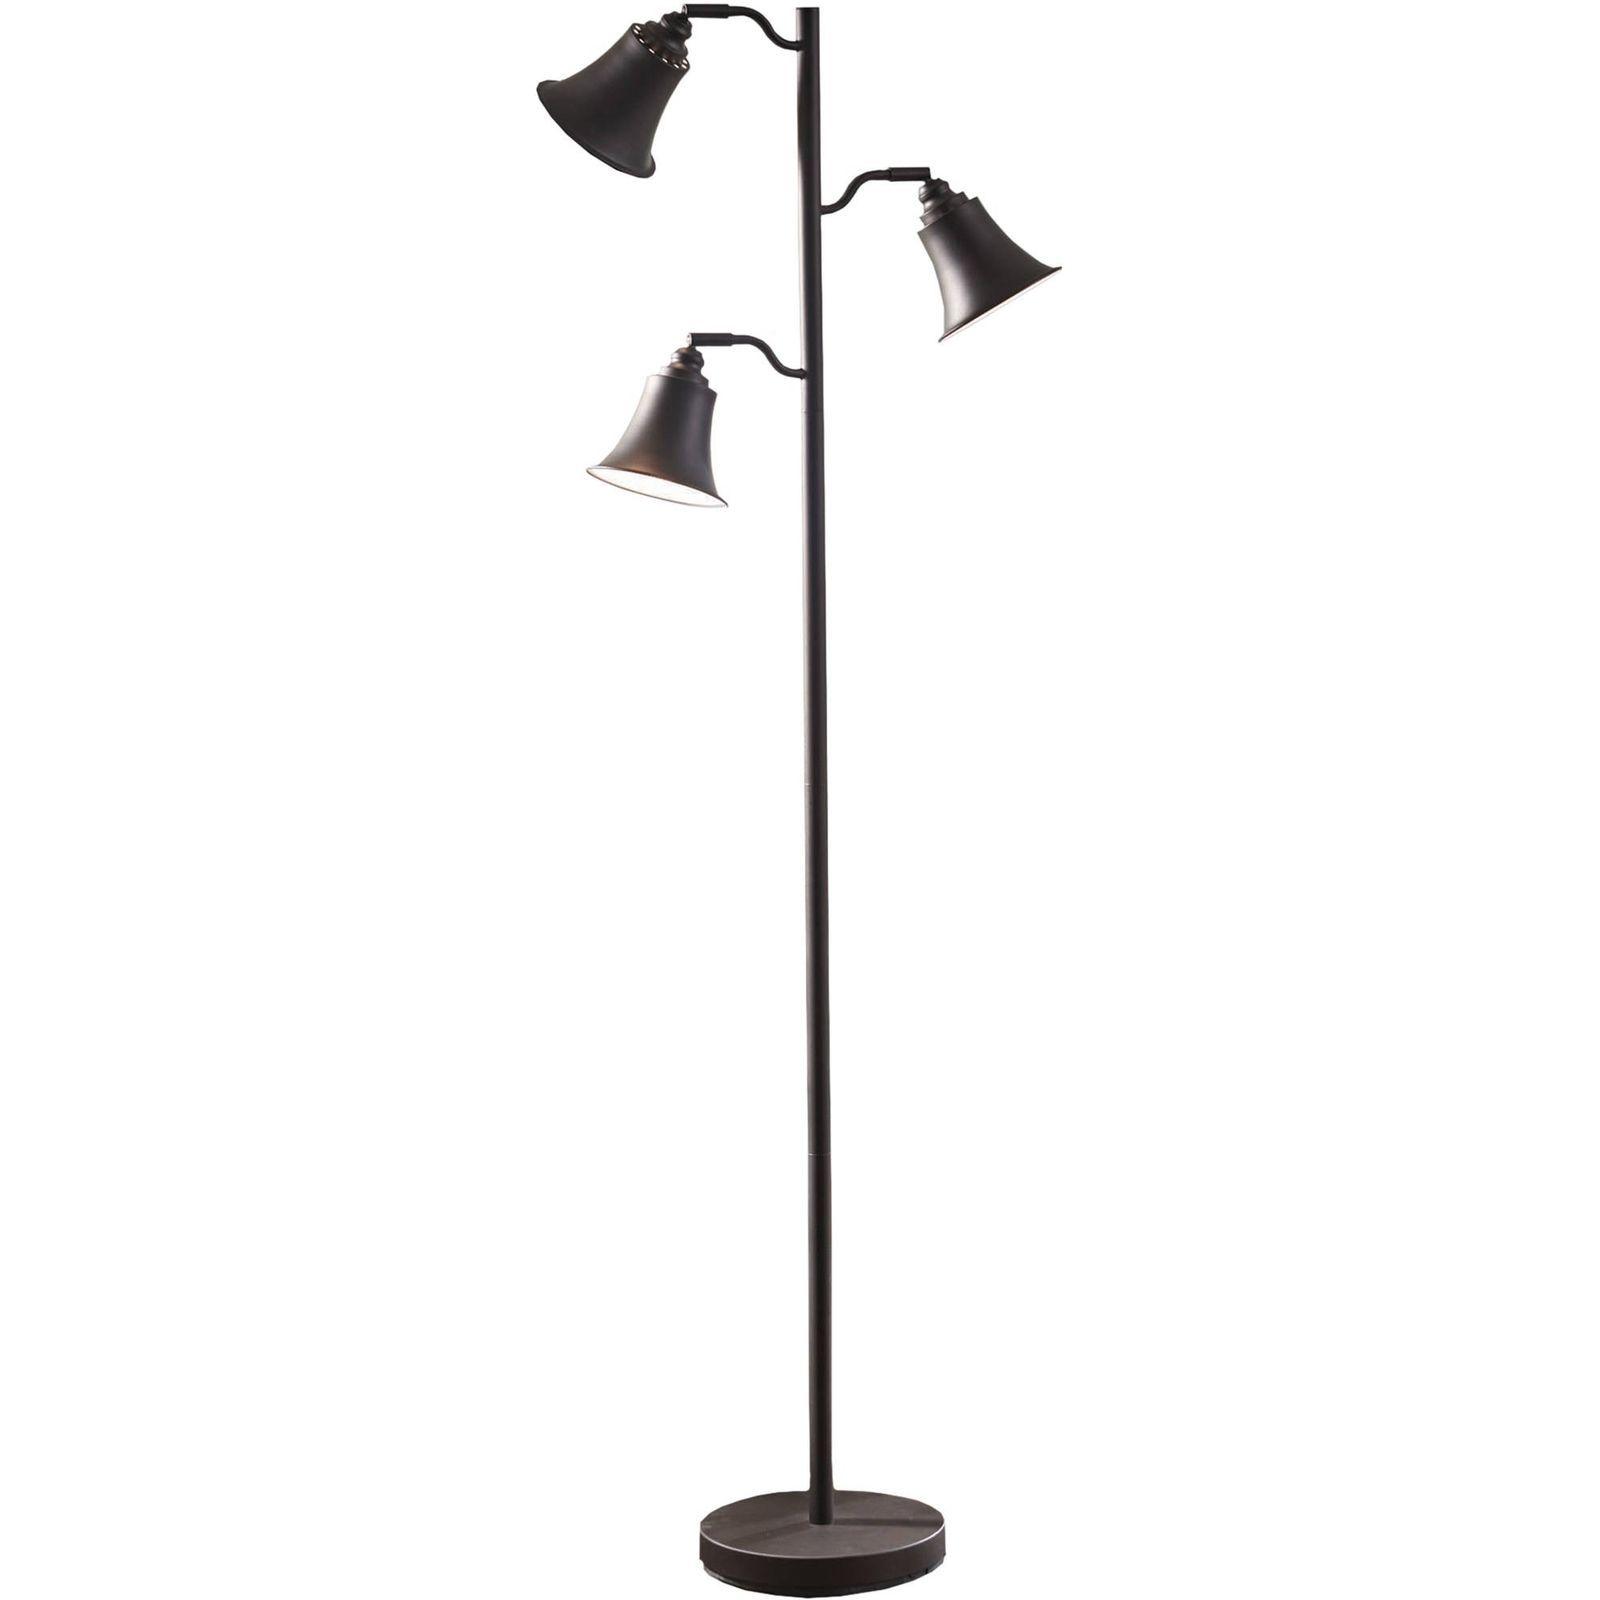 Steel Metal Tall Tree Style Floor Lamp For Bedroom Living Room ...